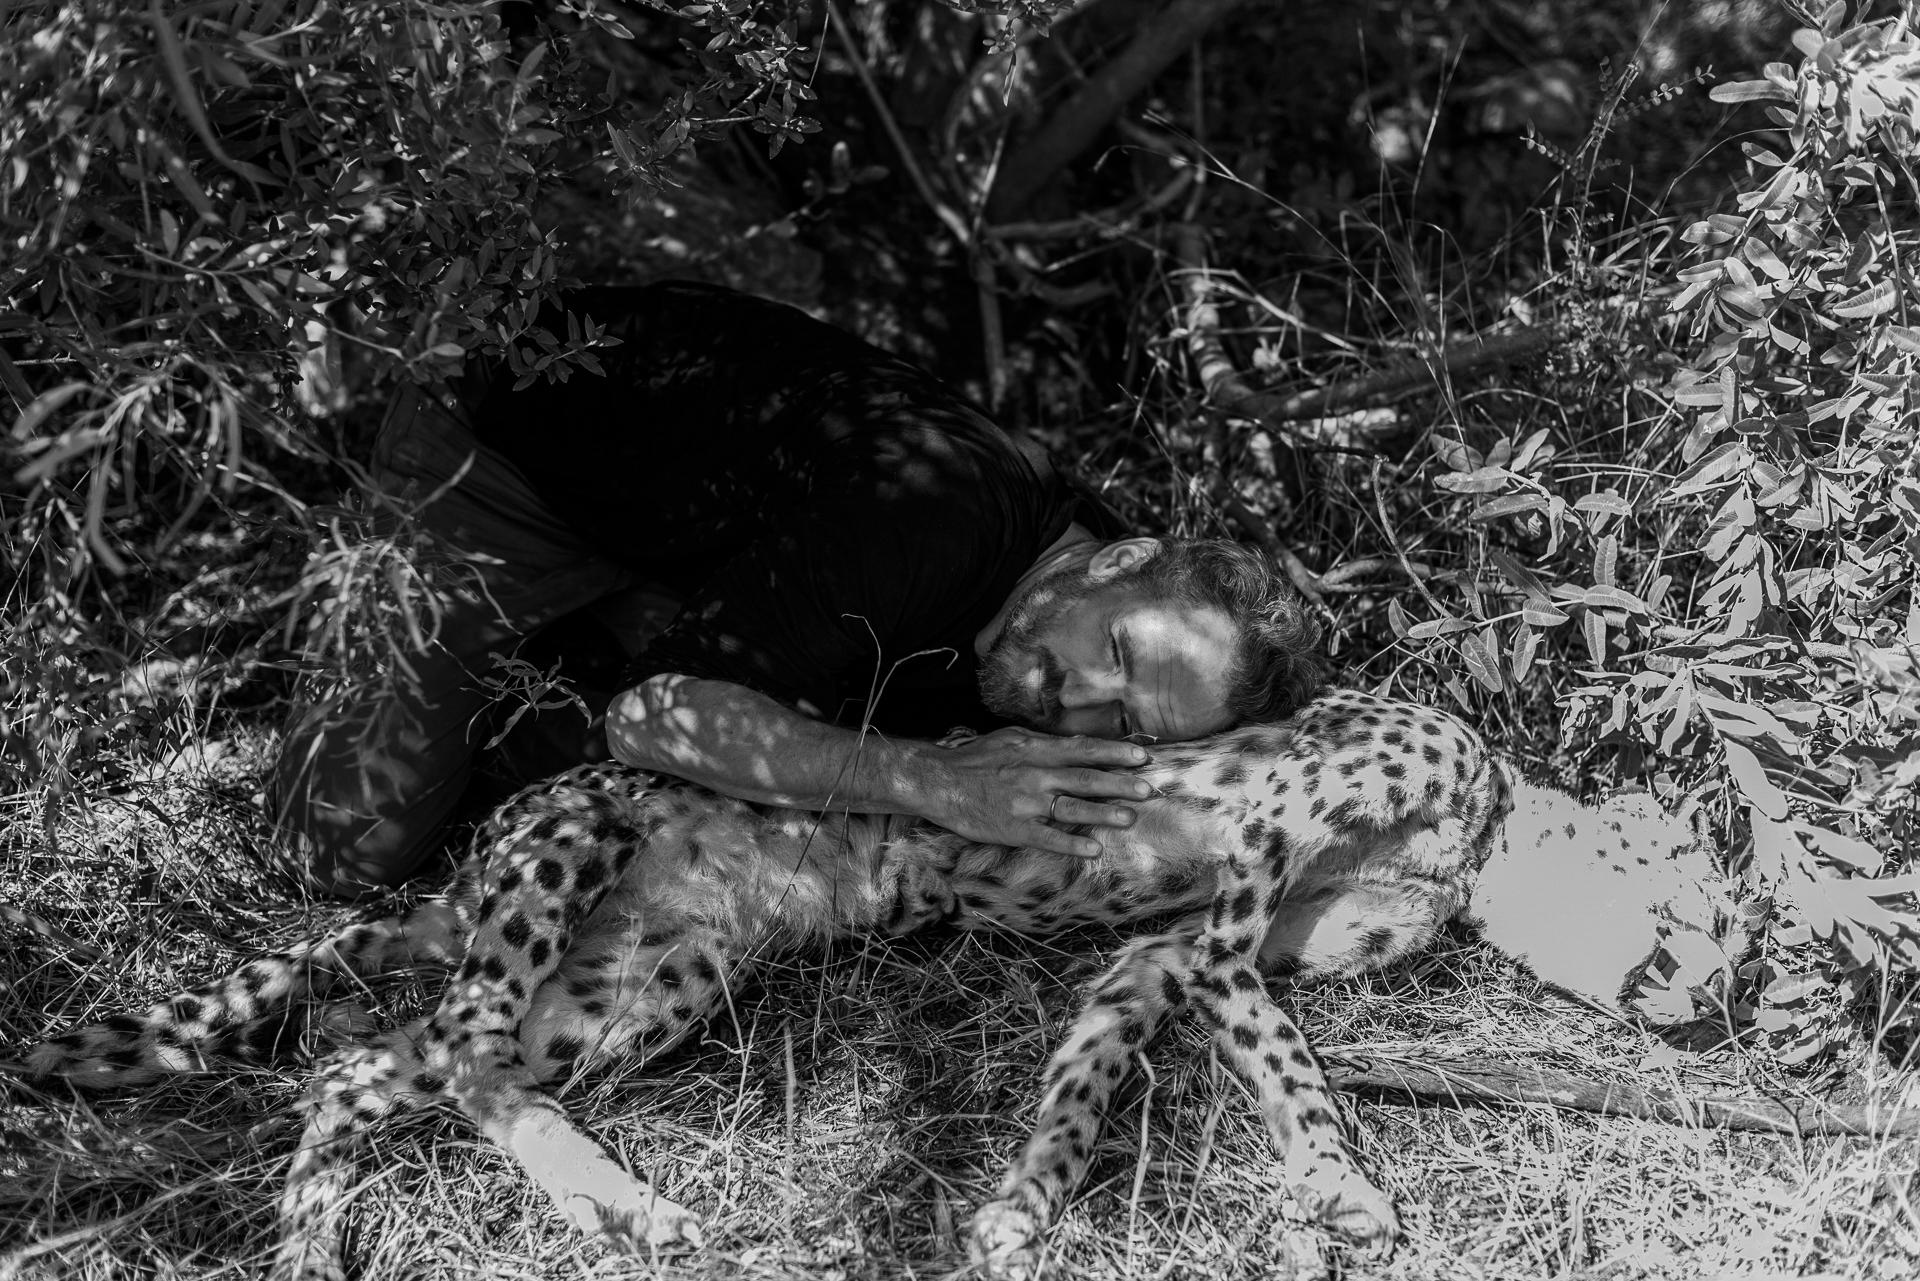 Shoot Day 09 of 19; Sc 3/8 pt 1; Ext. day 5; Cheetah: They; Fritz (Guido Hammesfahr), Kira (Thandi Sebe); find the baby cheetah.